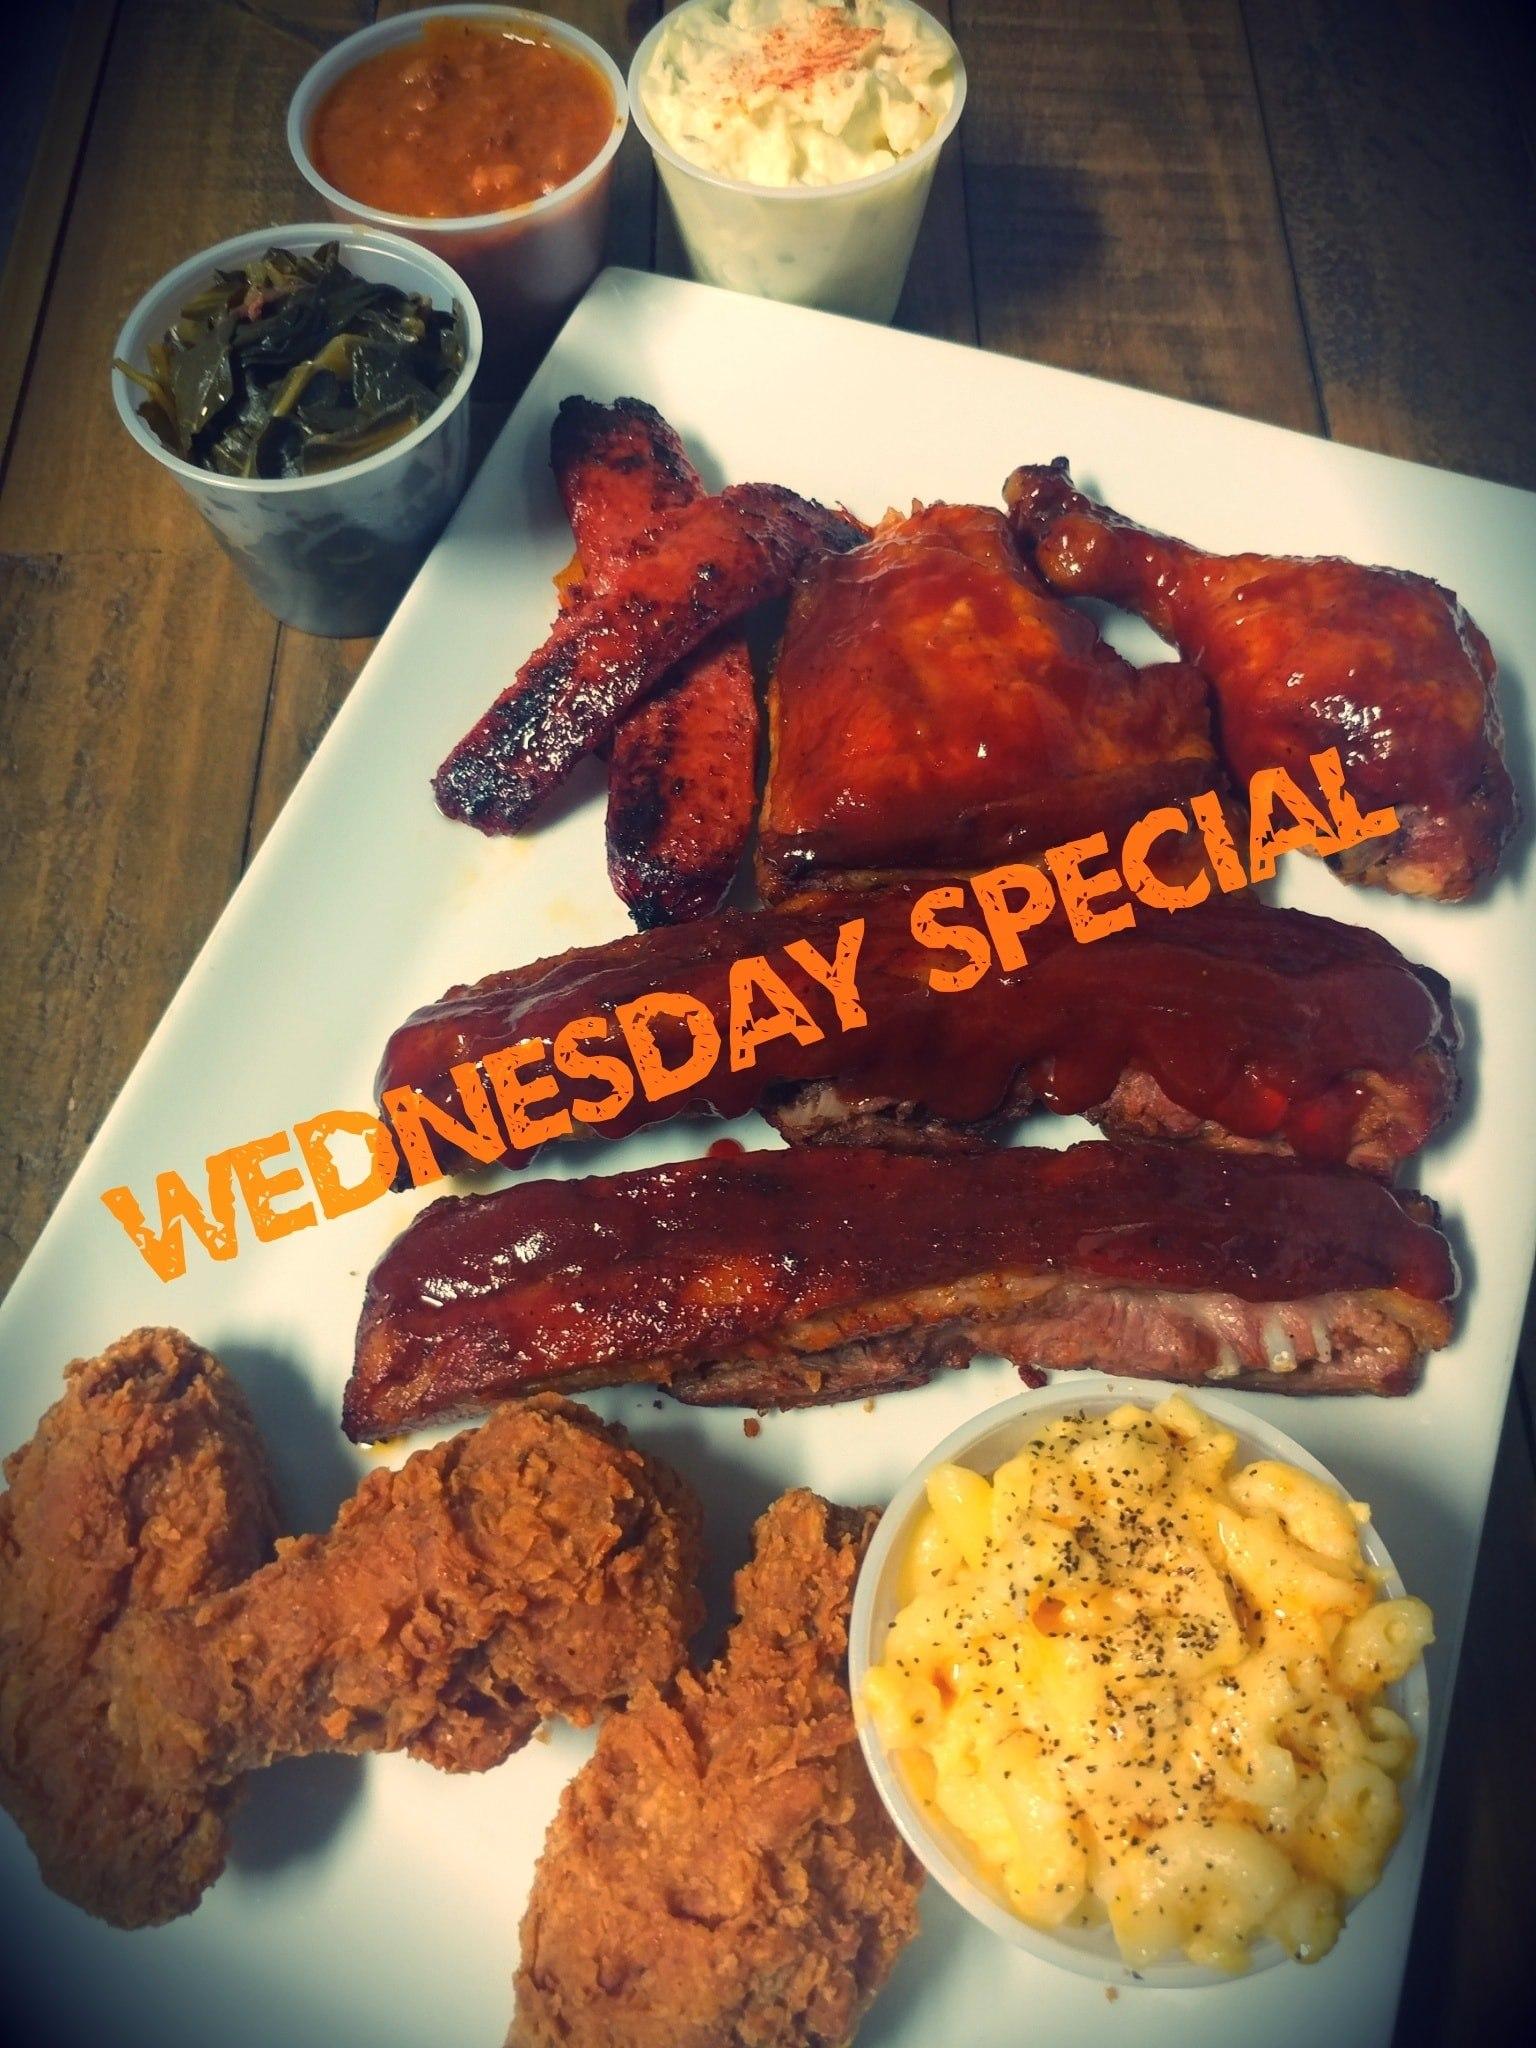 WEDNESDAY: Soul Food Potluck